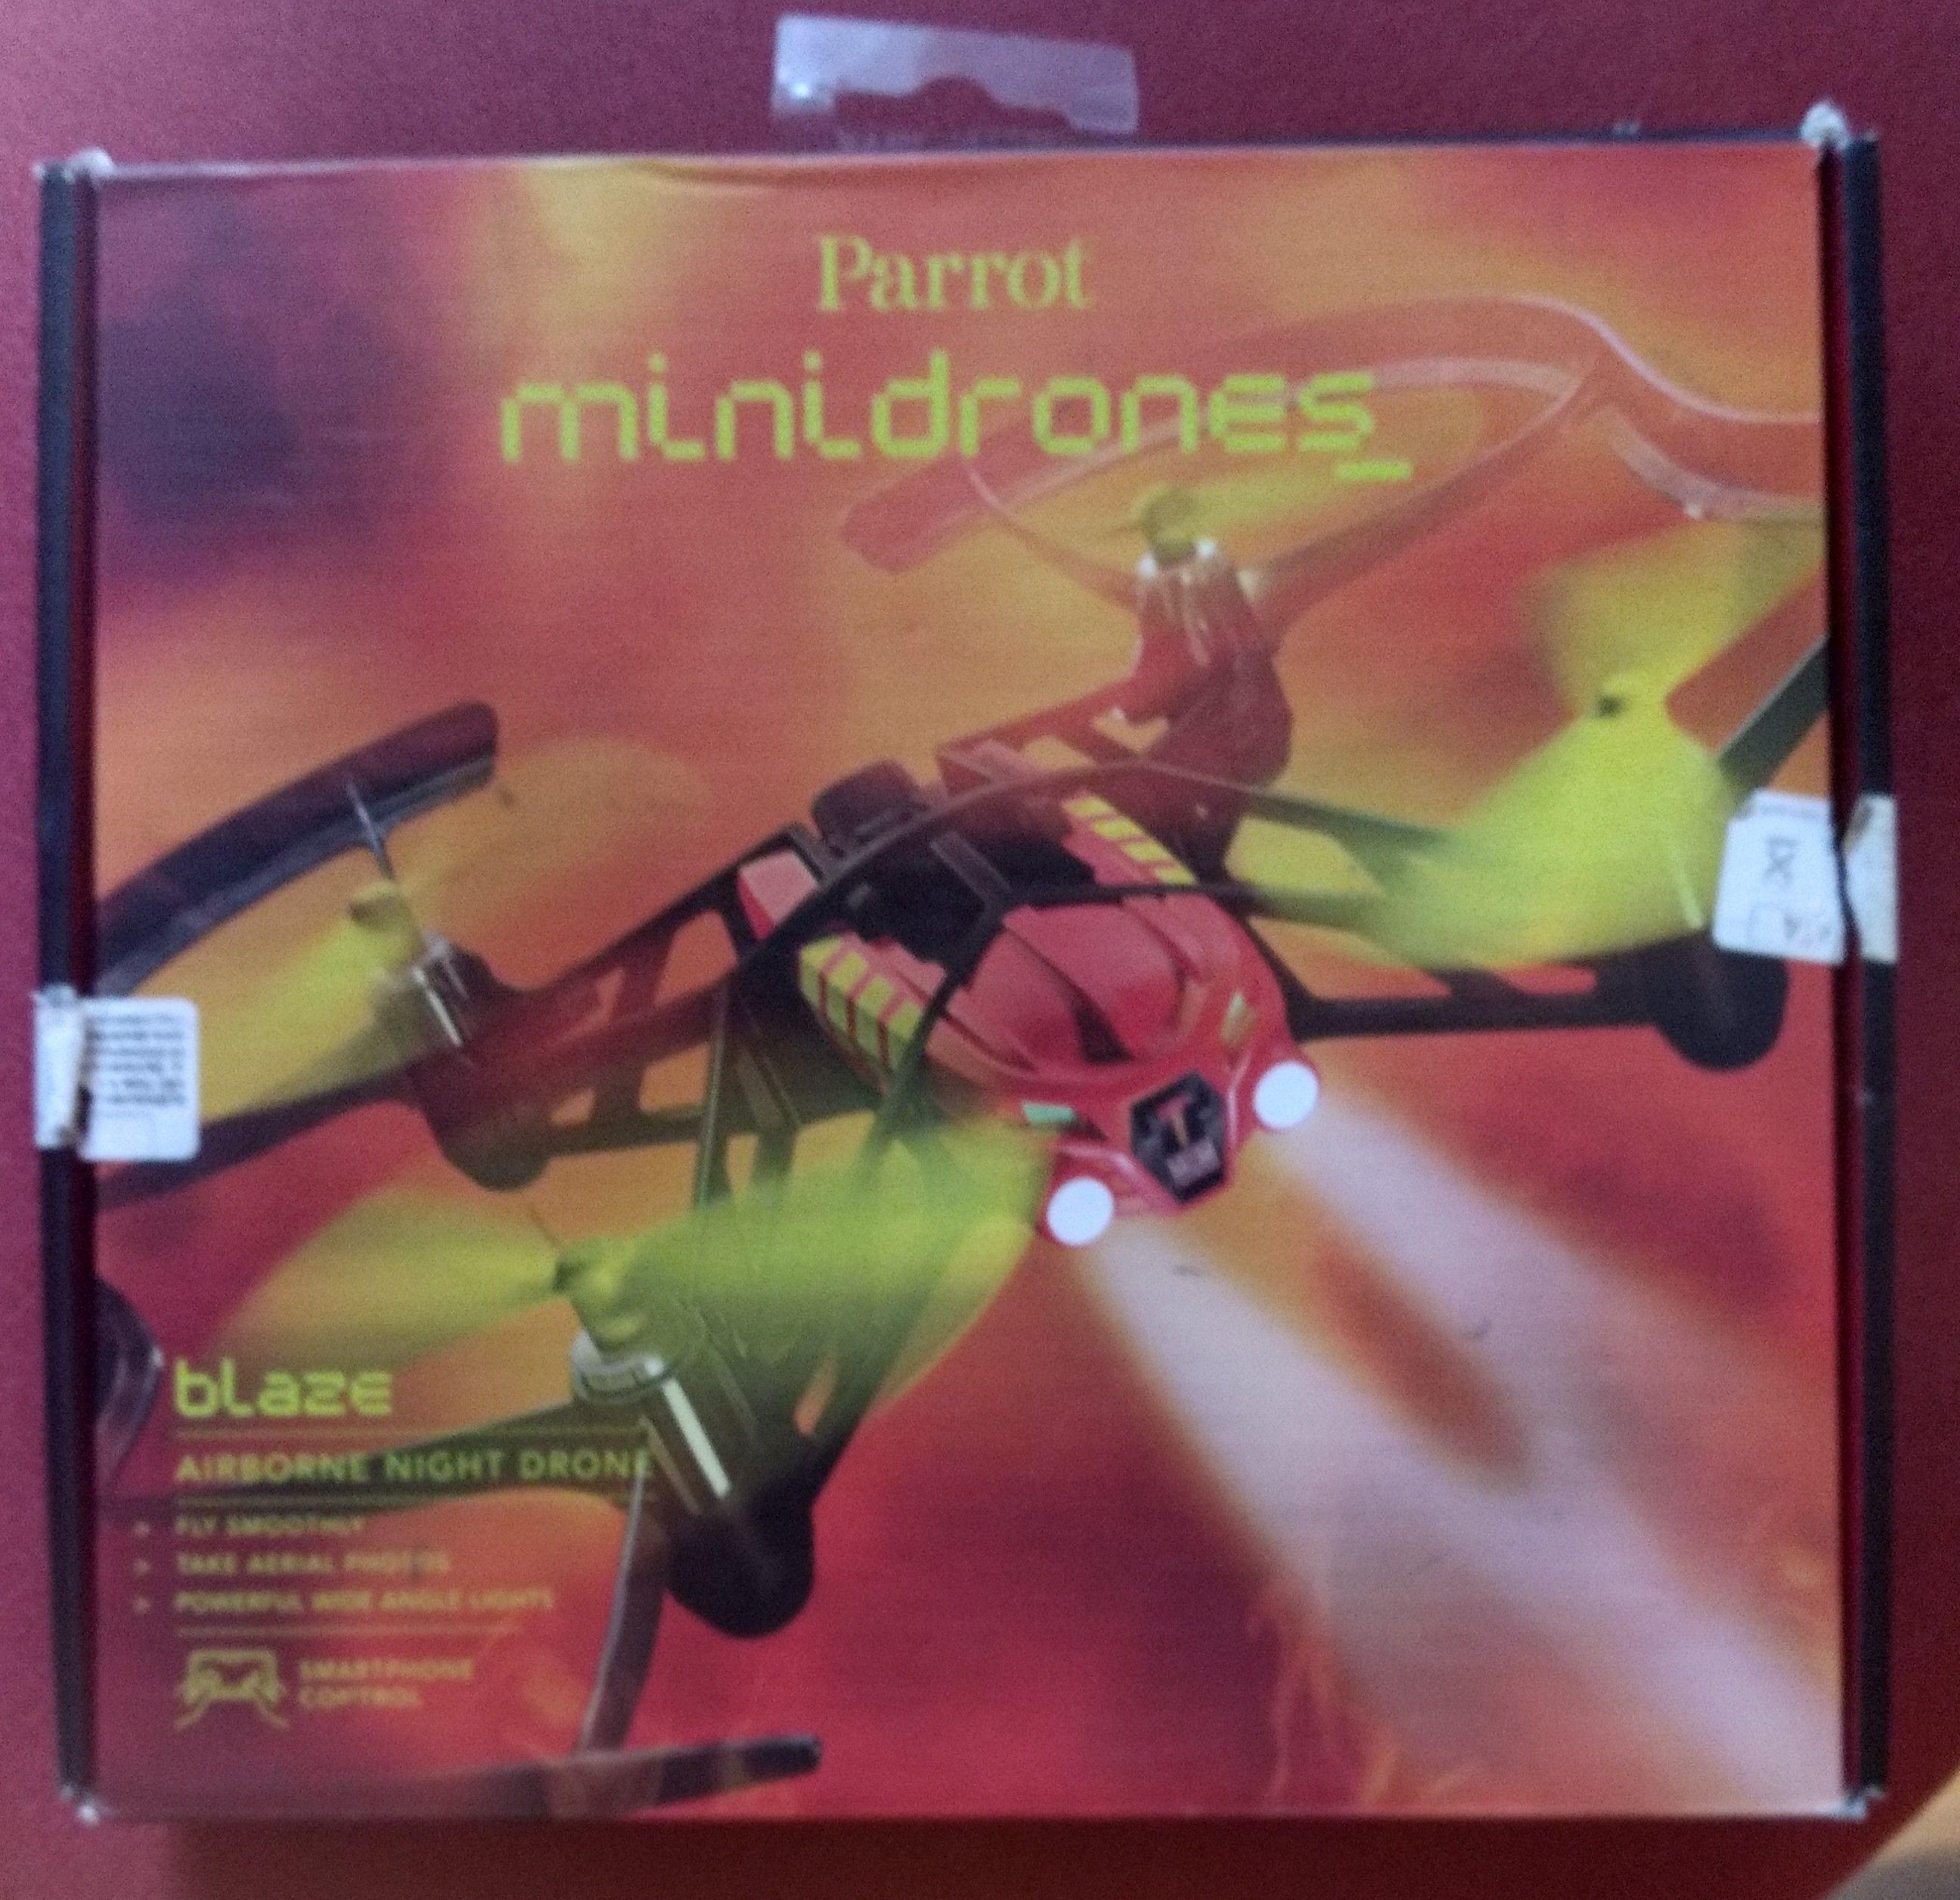 Parrot minidrones blaze #Biedronka